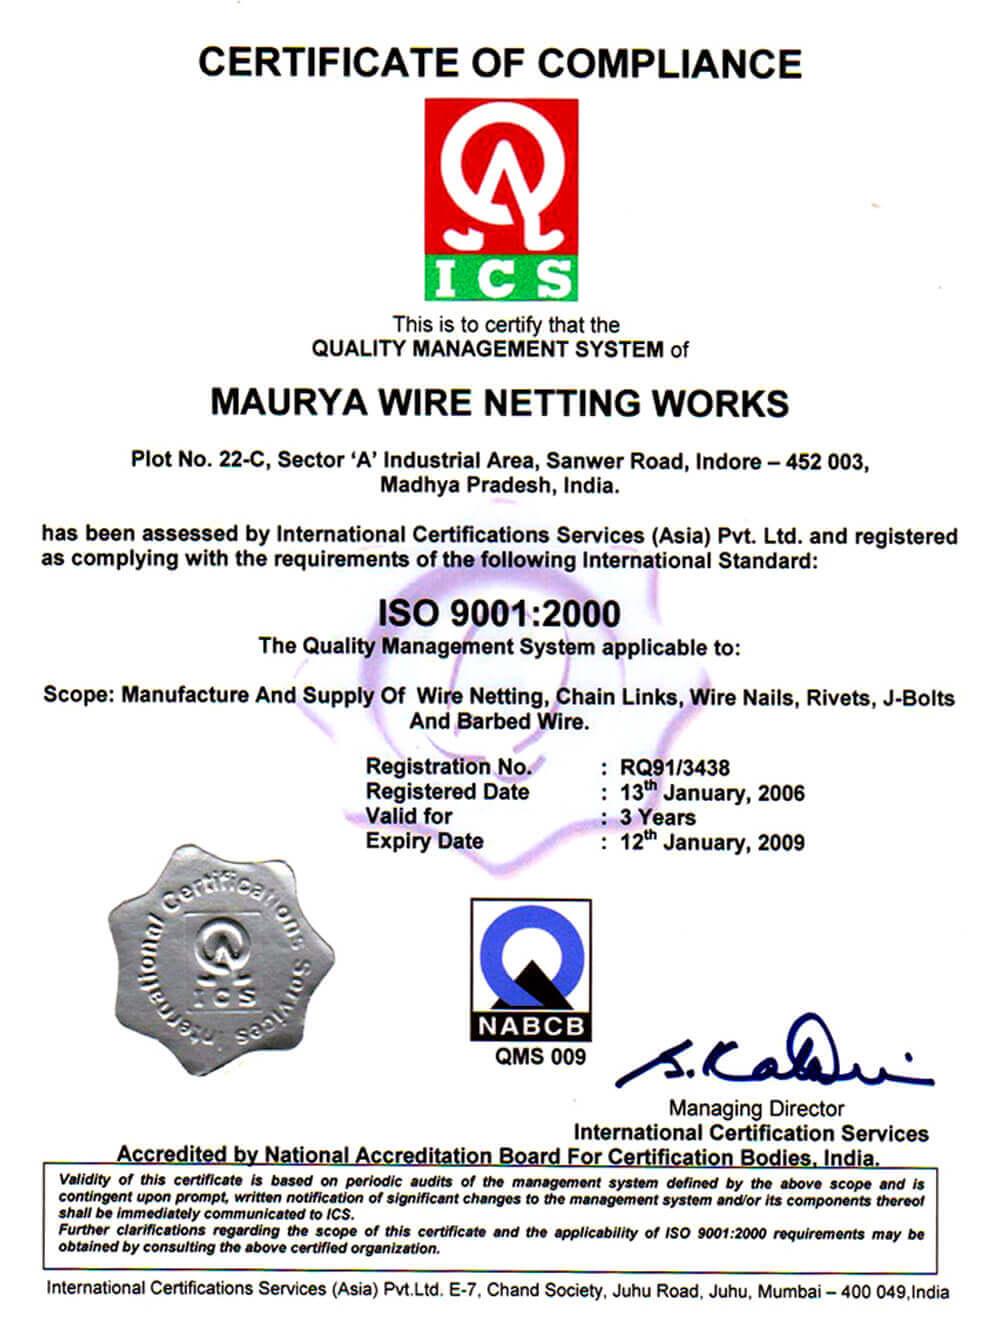 Maurya Wire Netting Works